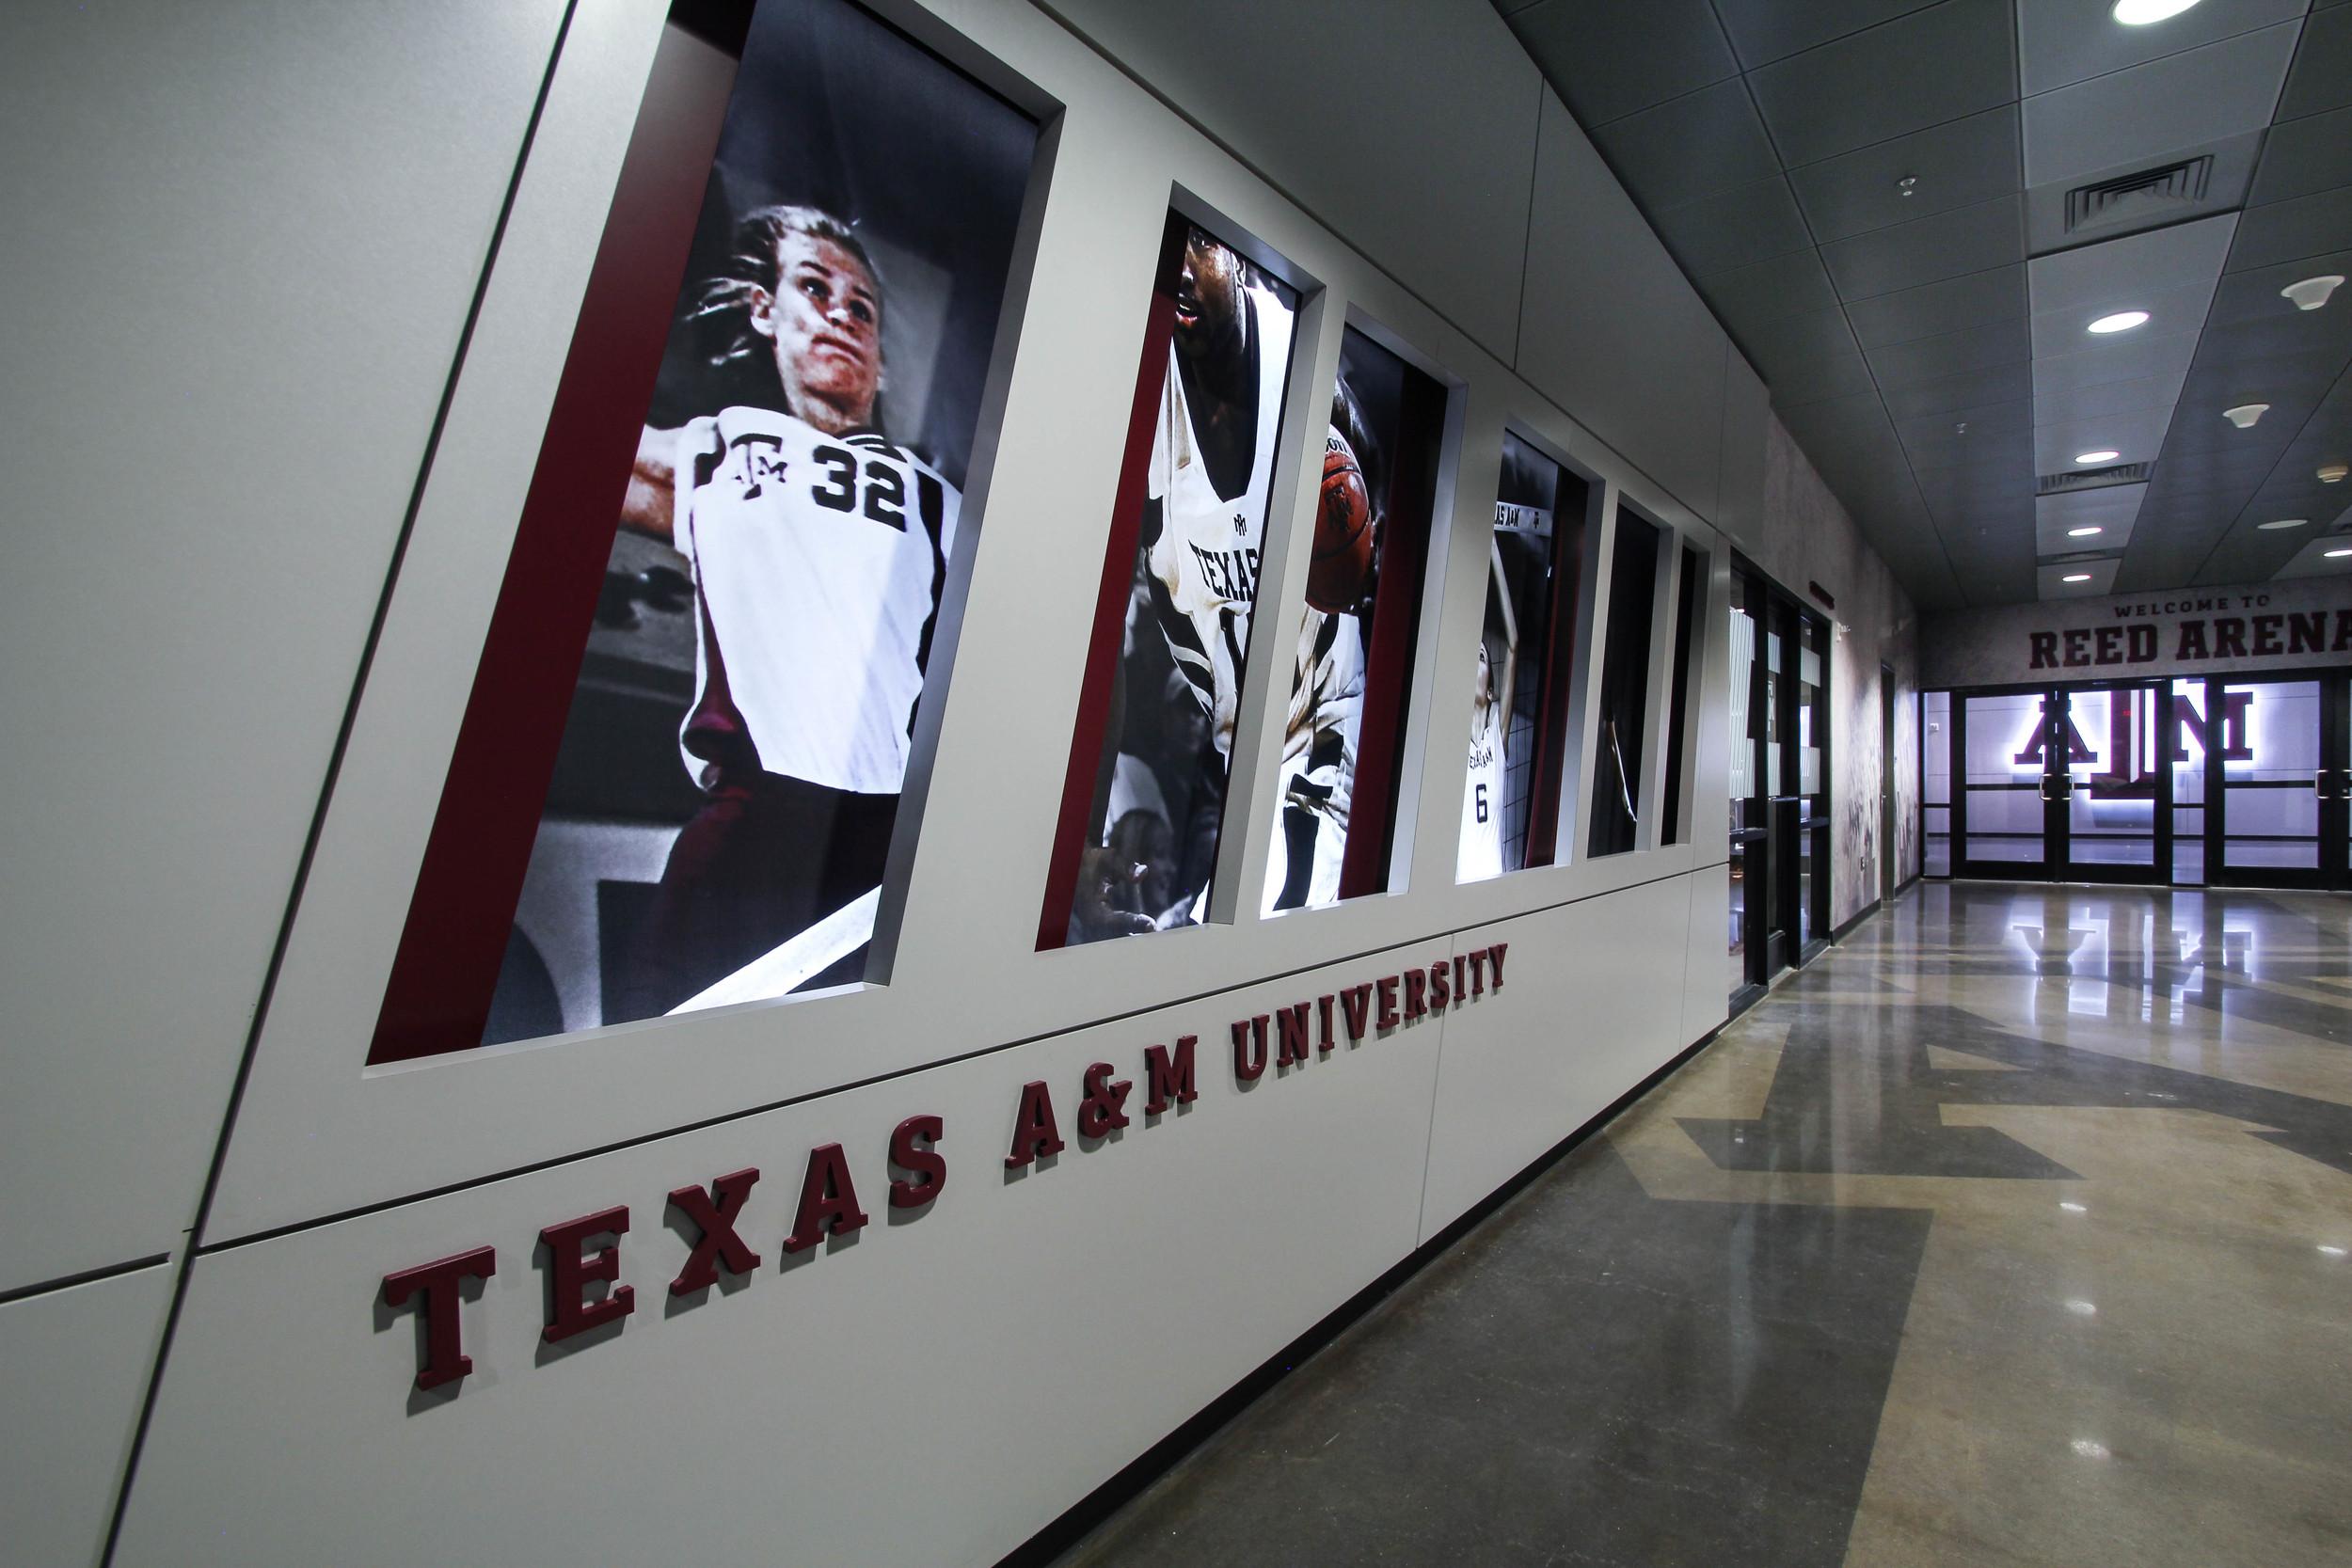 Texas A&M Rebrand